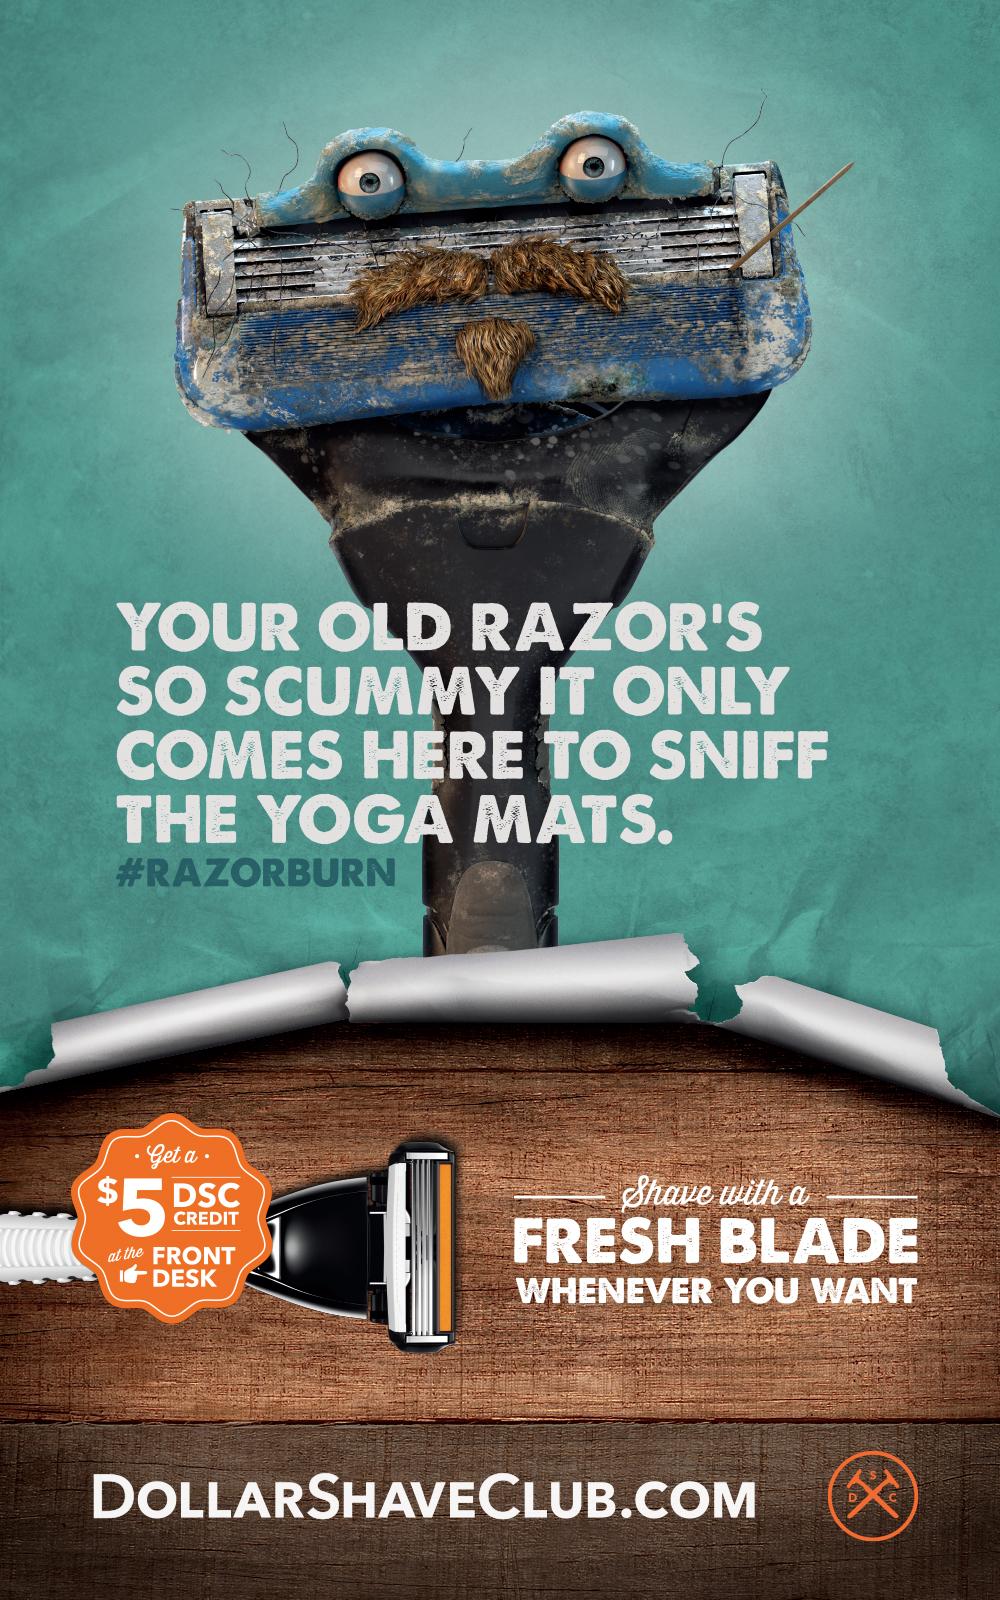 f6c7dc9d 4ae6 4d1b 8fdb 4273344658df live the fresh blade shave the shorty awards